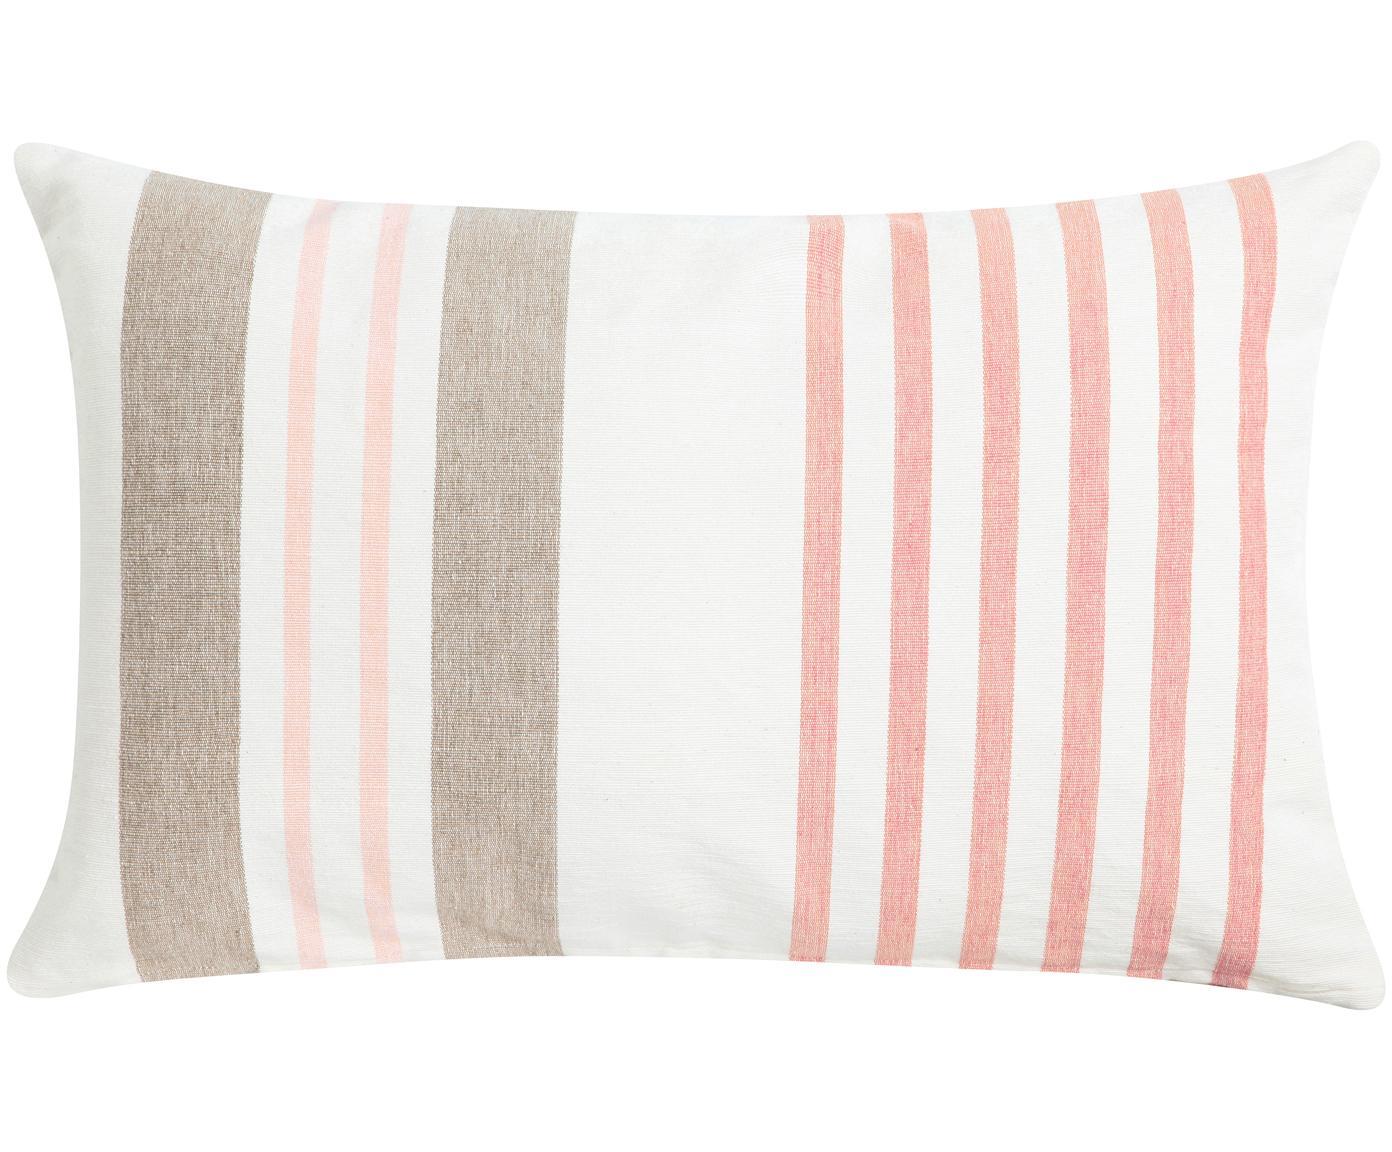 Cuscino con imbottitura Beach House, Rivestimento: cotone, Bianco, marrone, rosa, Larg. 40 x Lung. 60 cm